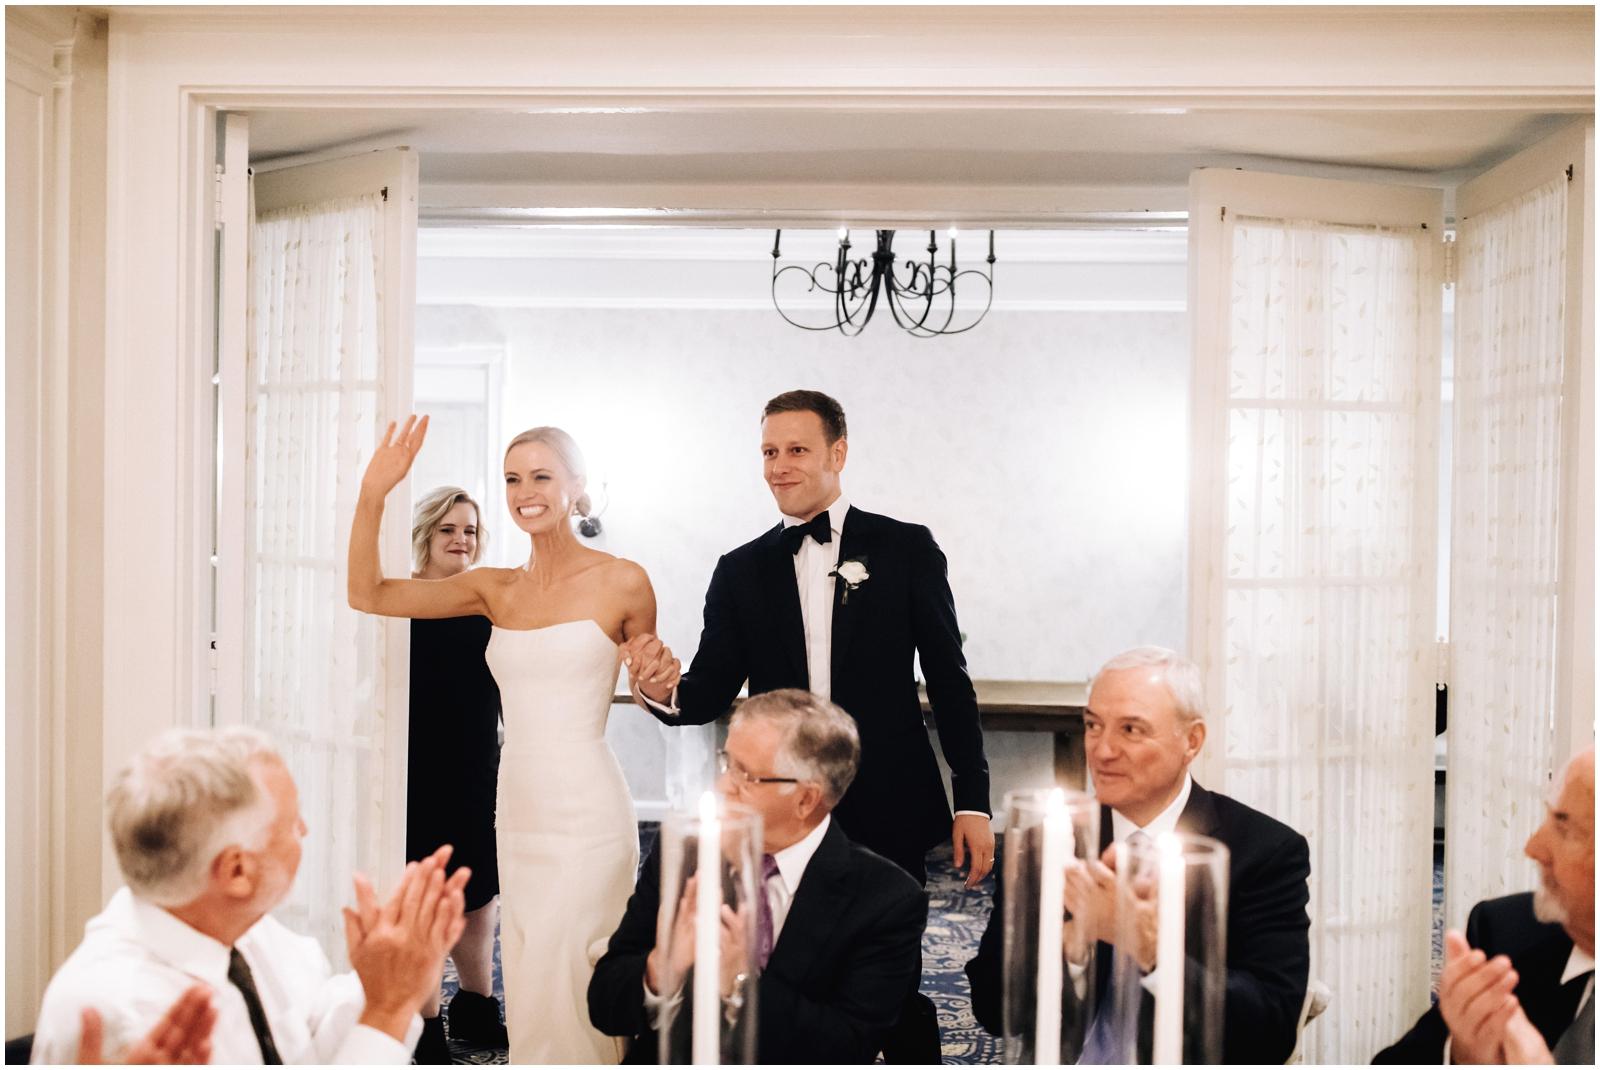 Minnesota Wedding Planner. Lafayette Club Wedding. Wedding Reception Inspiration. Wedding Decor. Greenery Wedding. Bride and groom walking into the reception